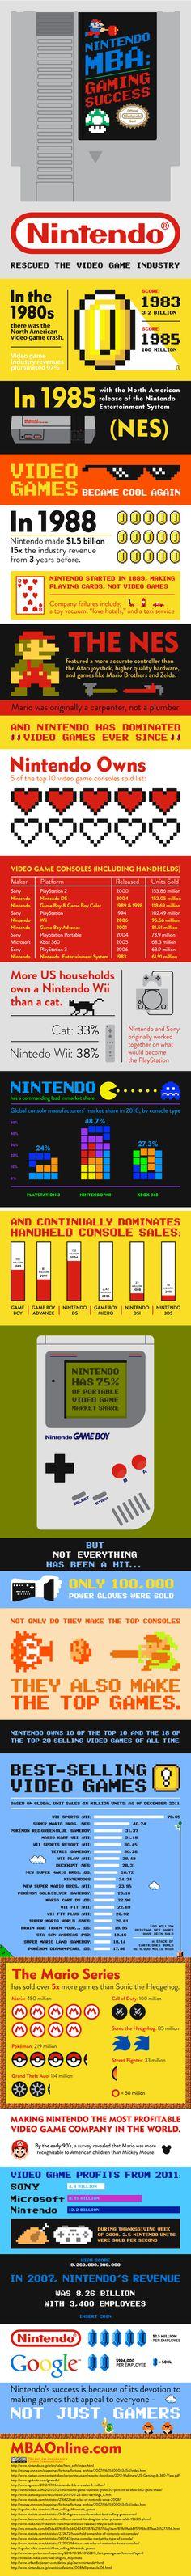 Rise of Nintendo #Nintendo